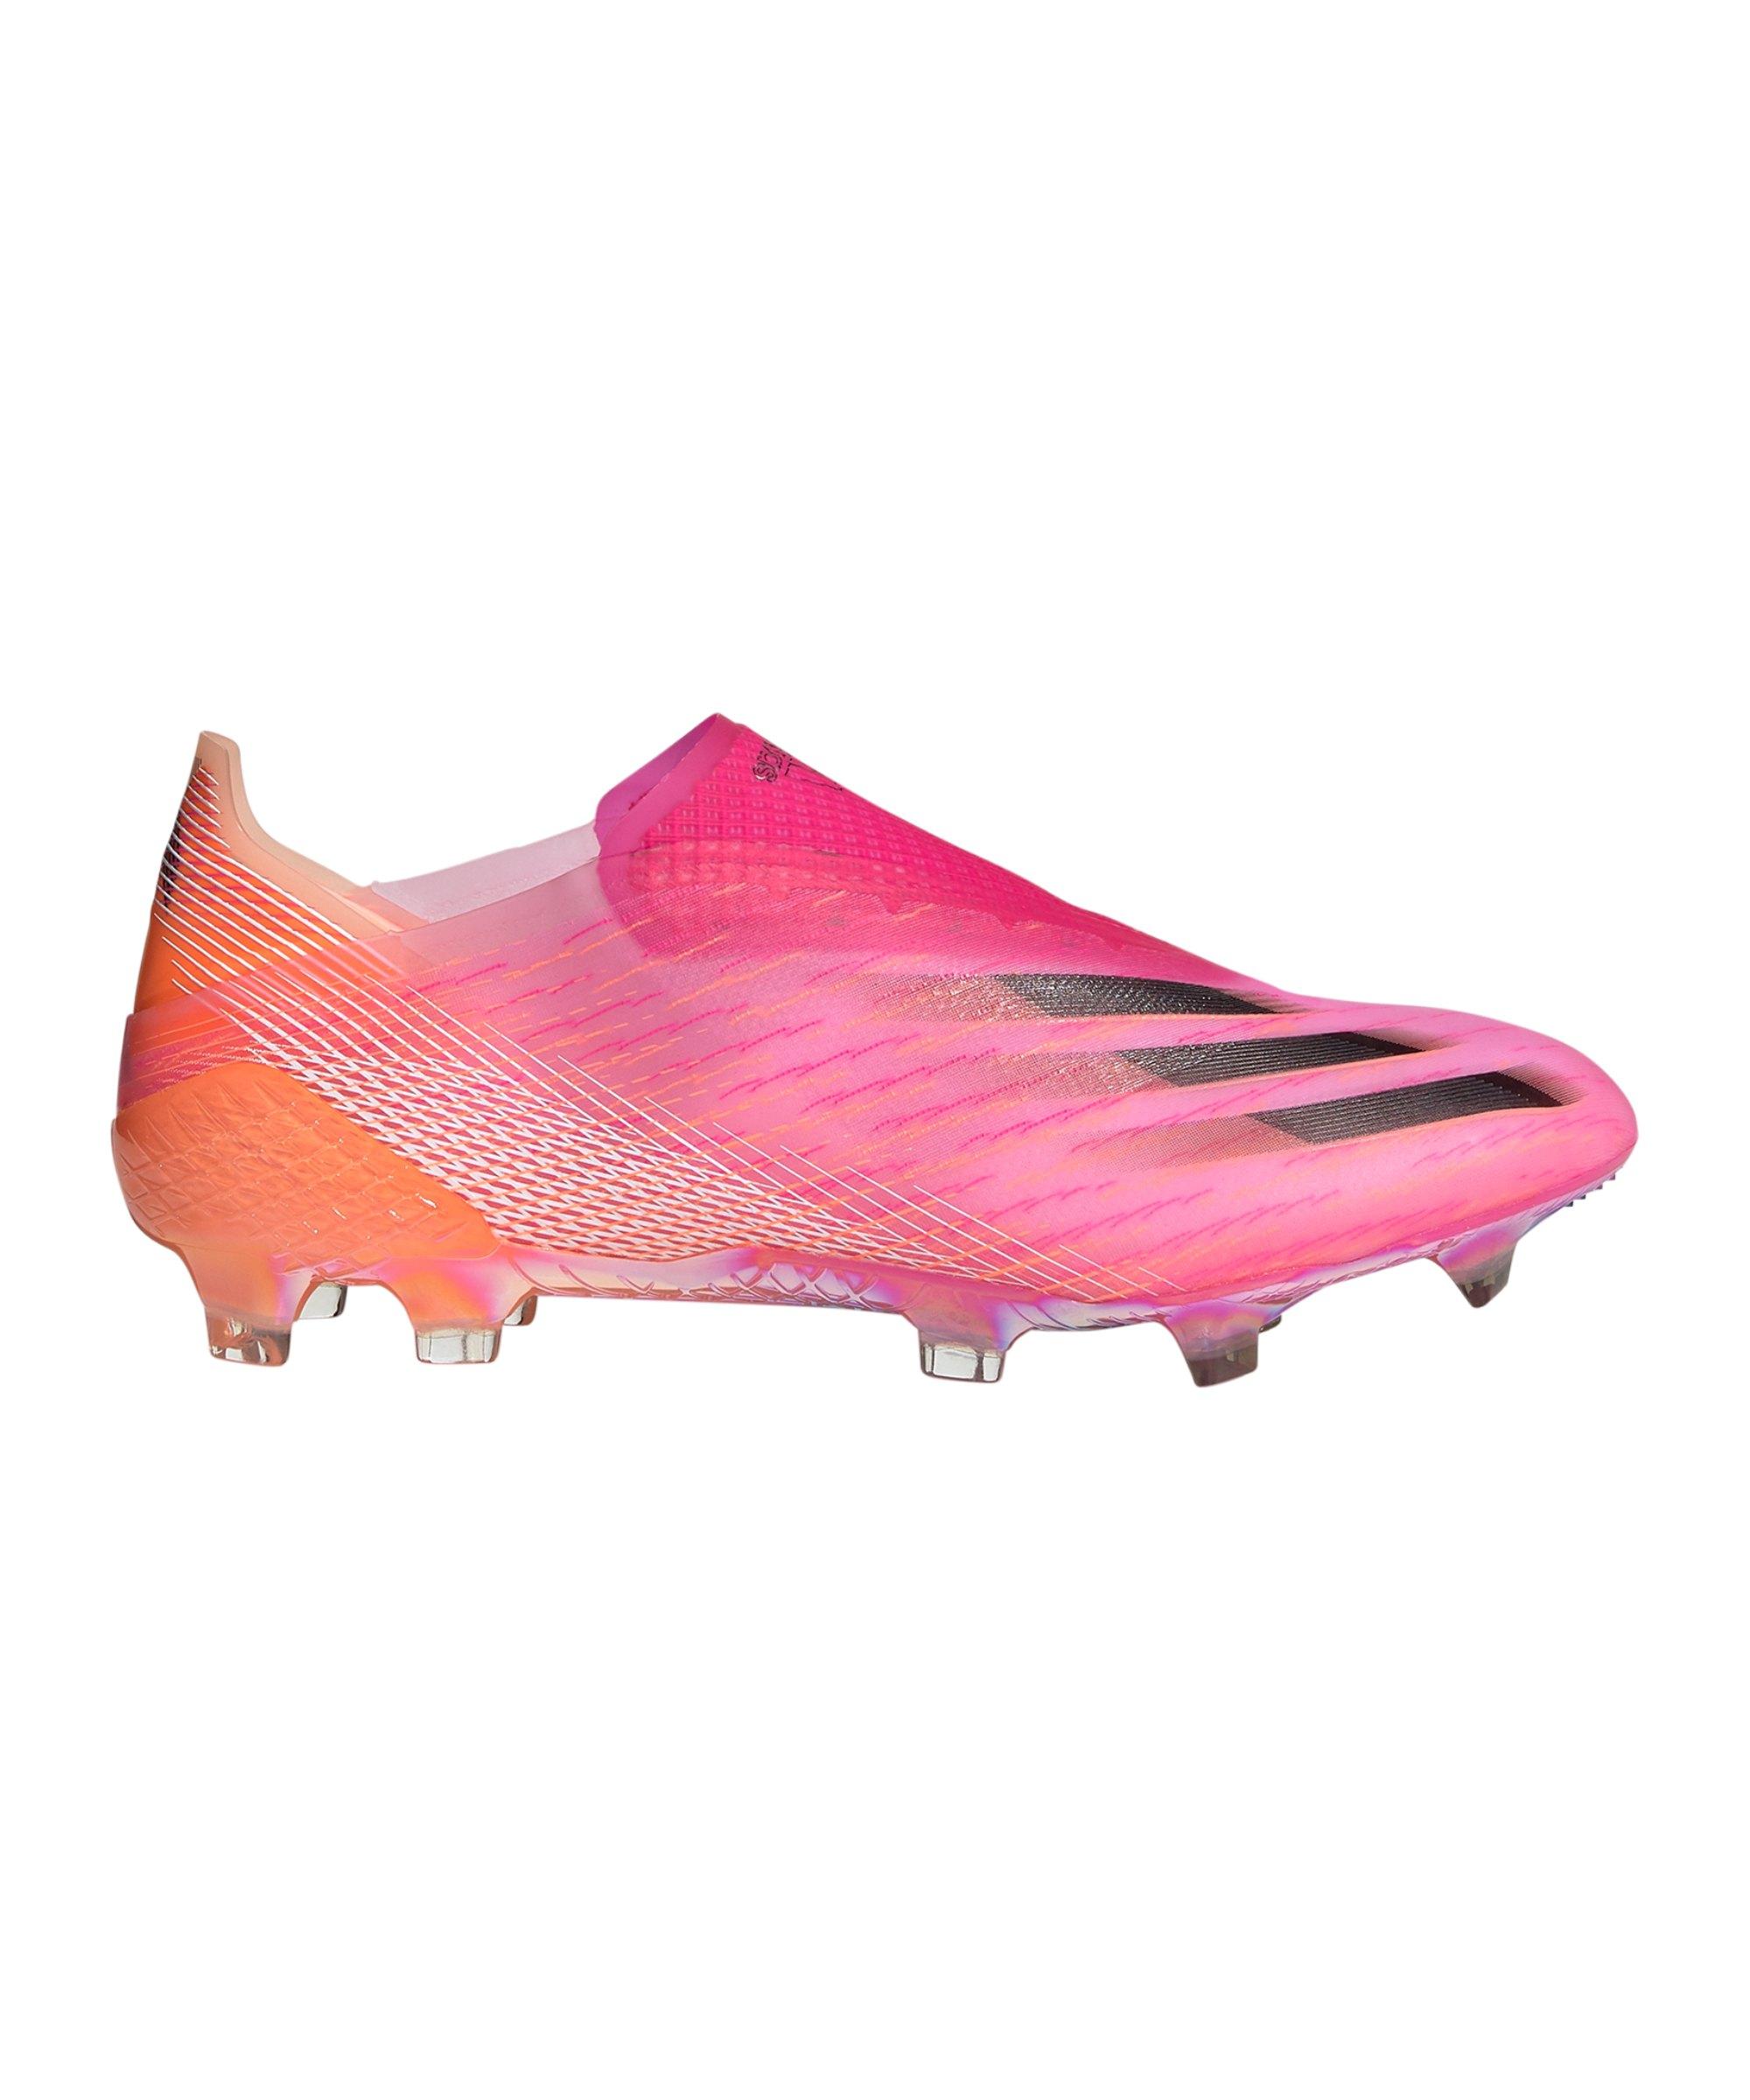 adidas X GHOSTED+ FG Superspectral Pink Schwarz Orange - pink